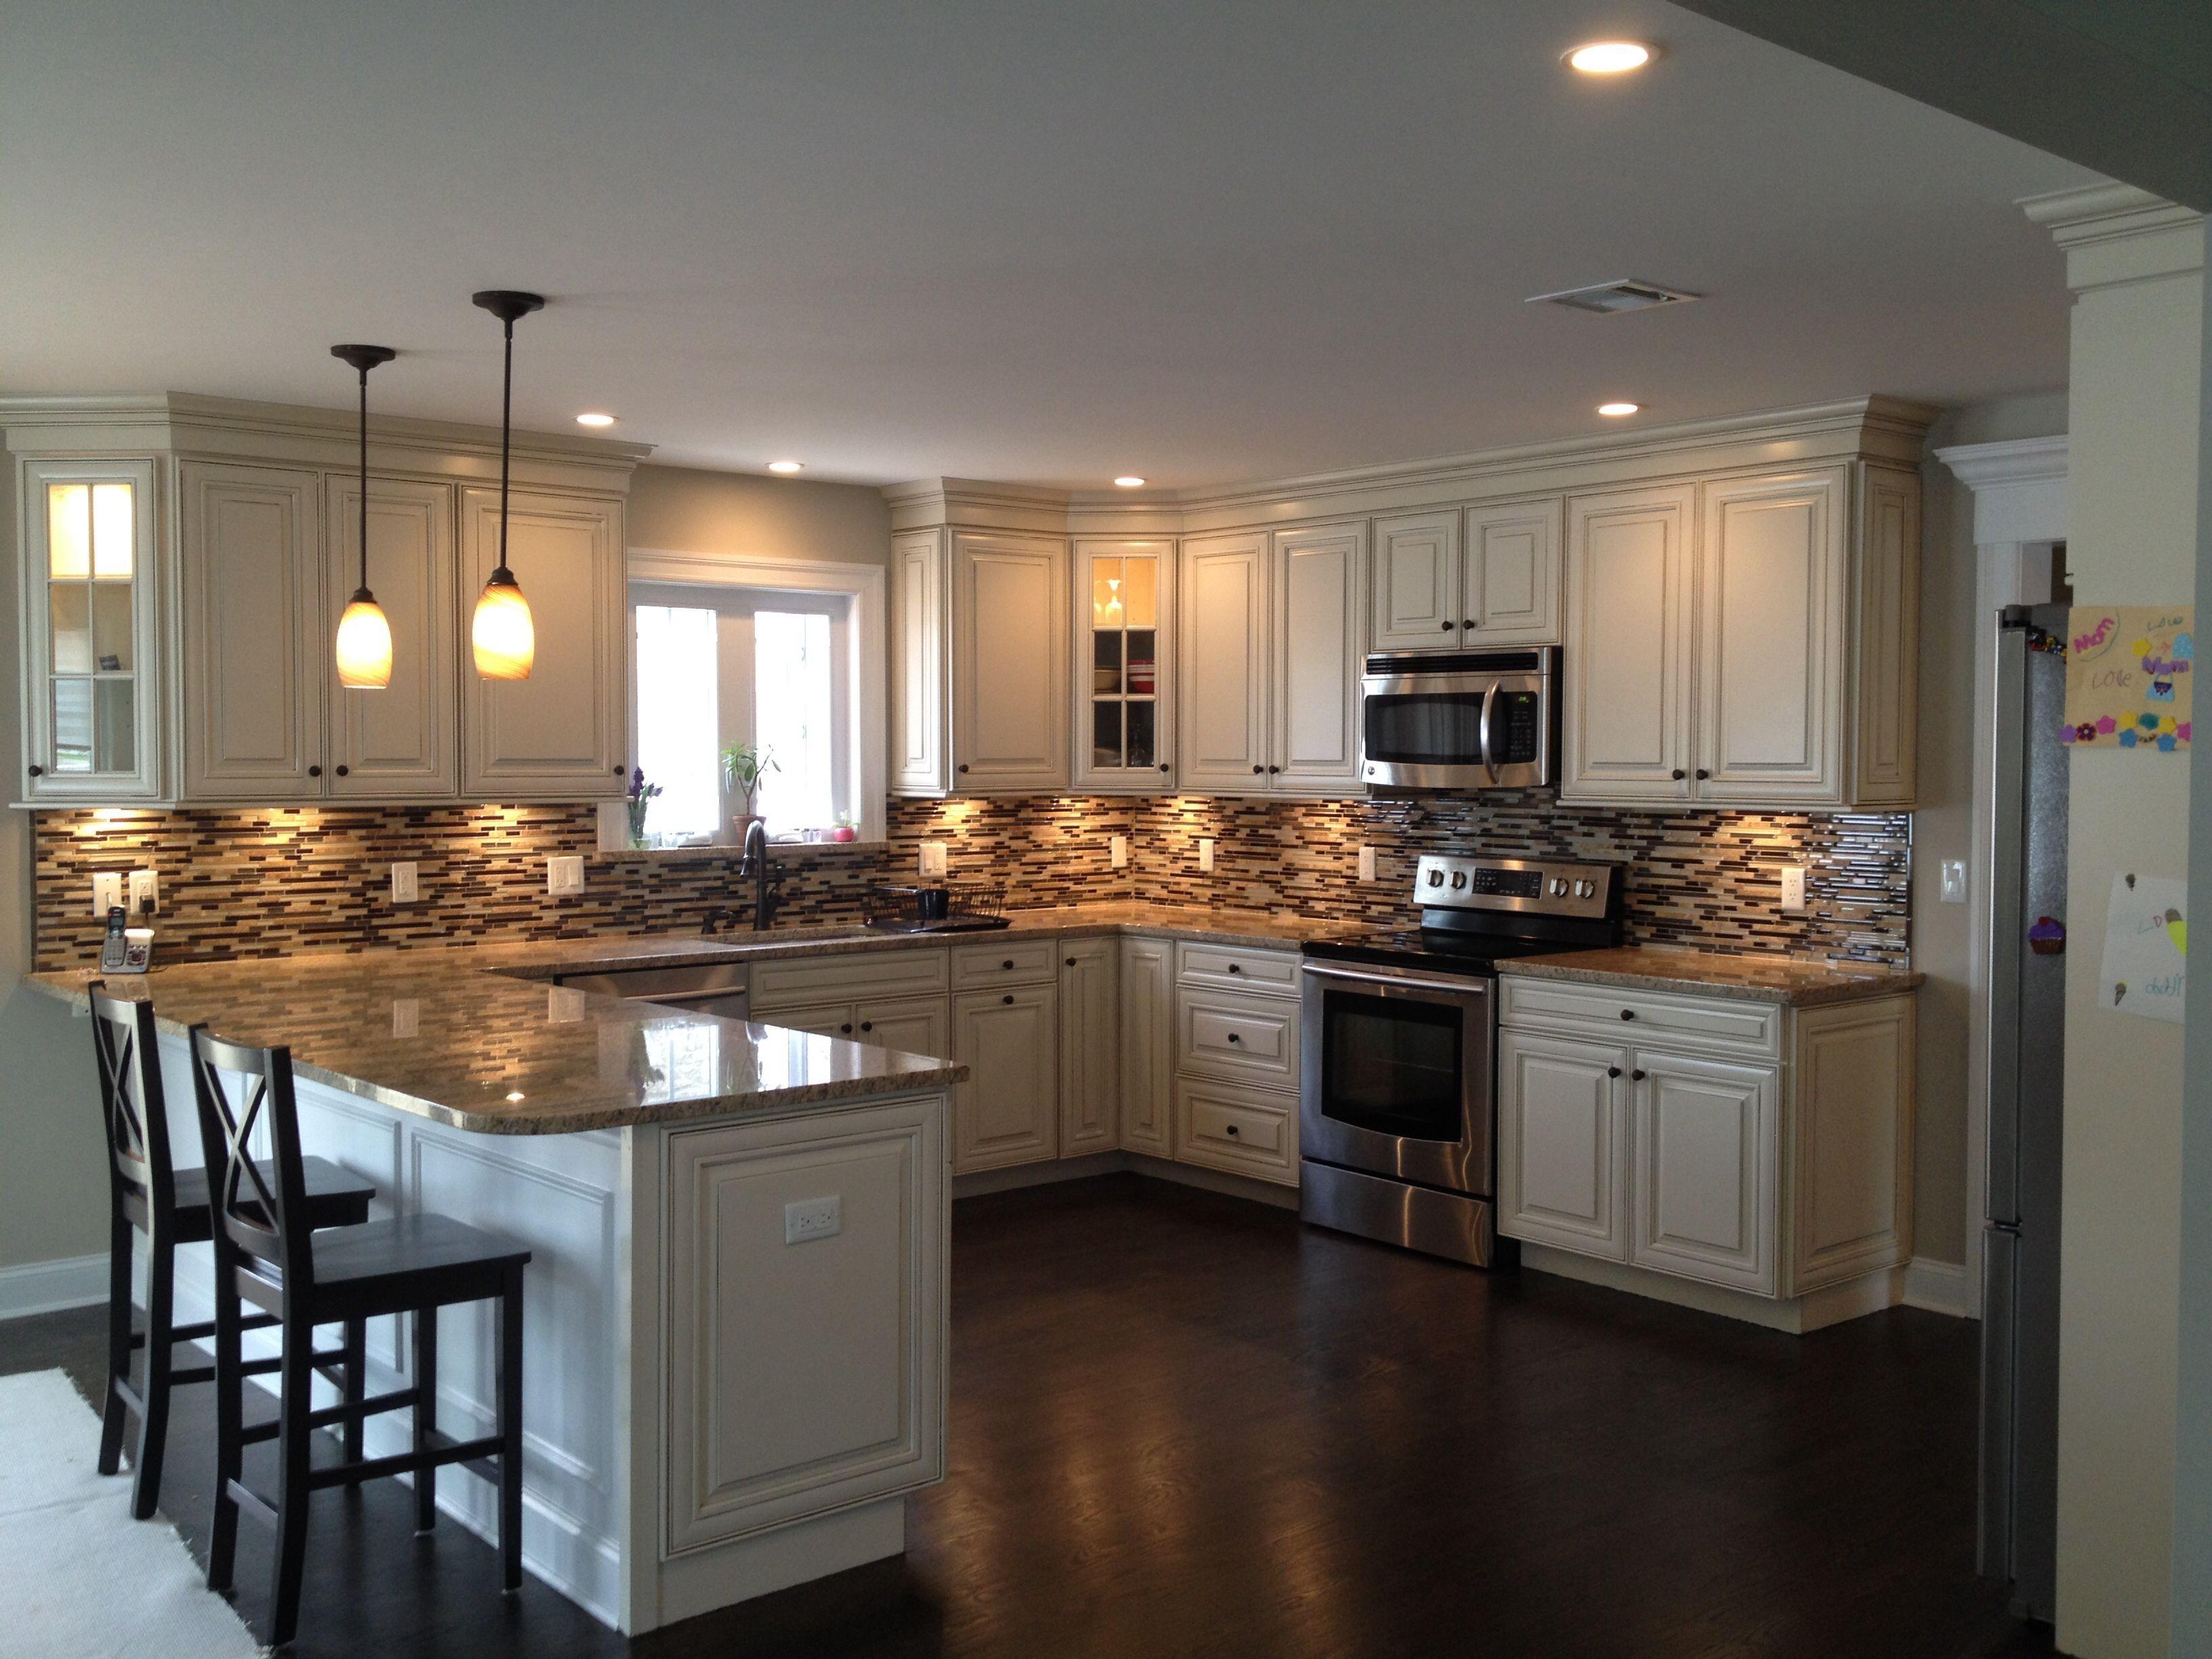 40 Wonderful U Shaped Kitchen Designs Ideas Kitchen Remodel Small Kitchen Layout Plans Peninsula Kitchen Design